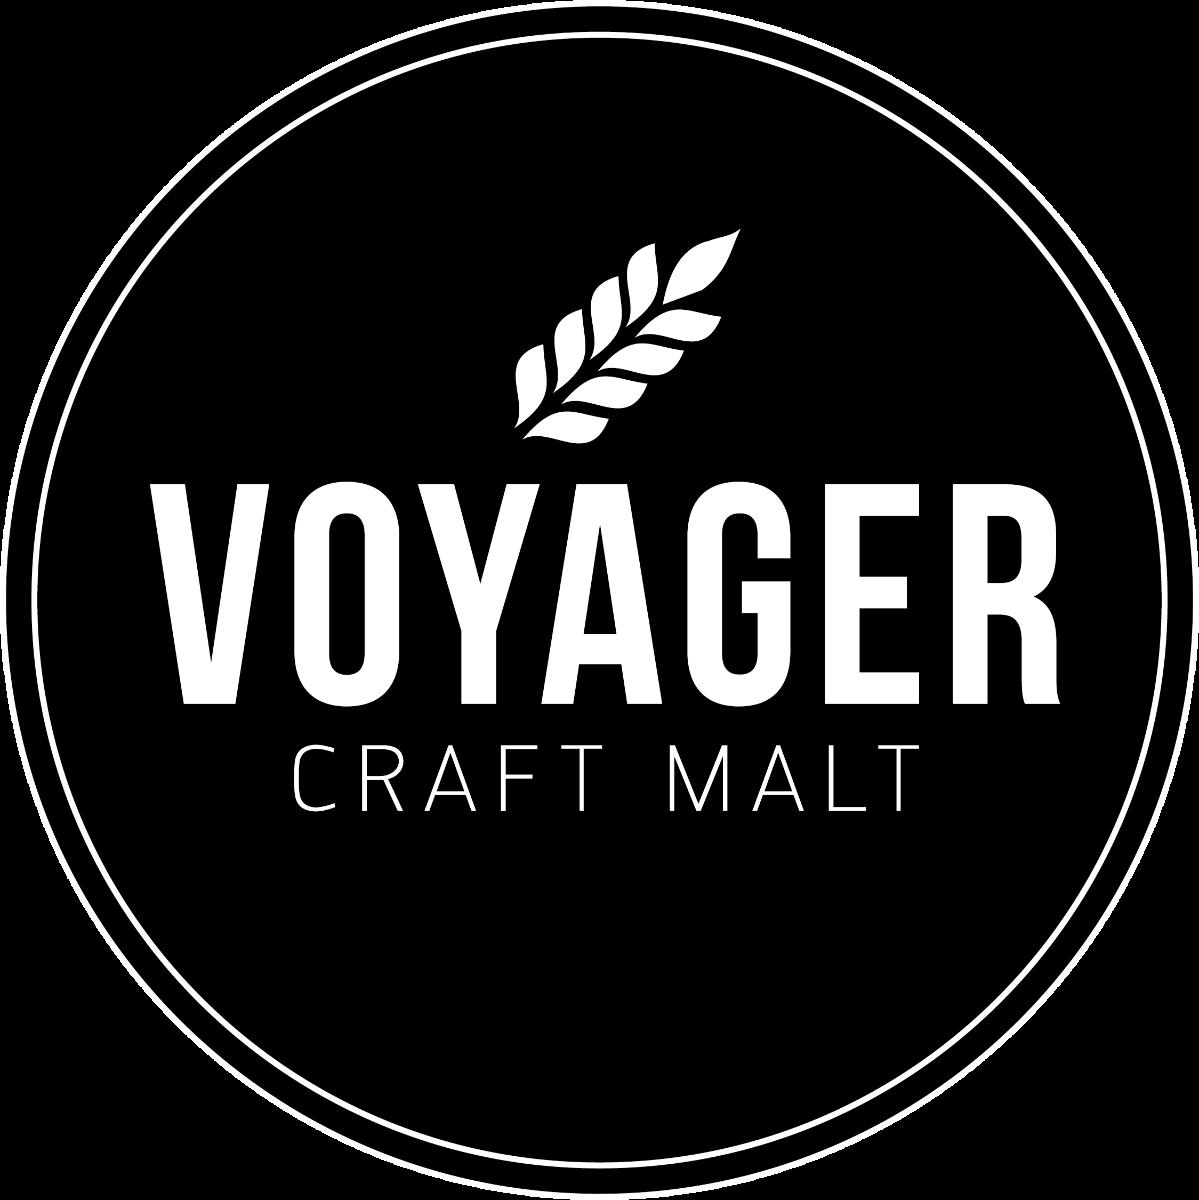 Voyager Veloria